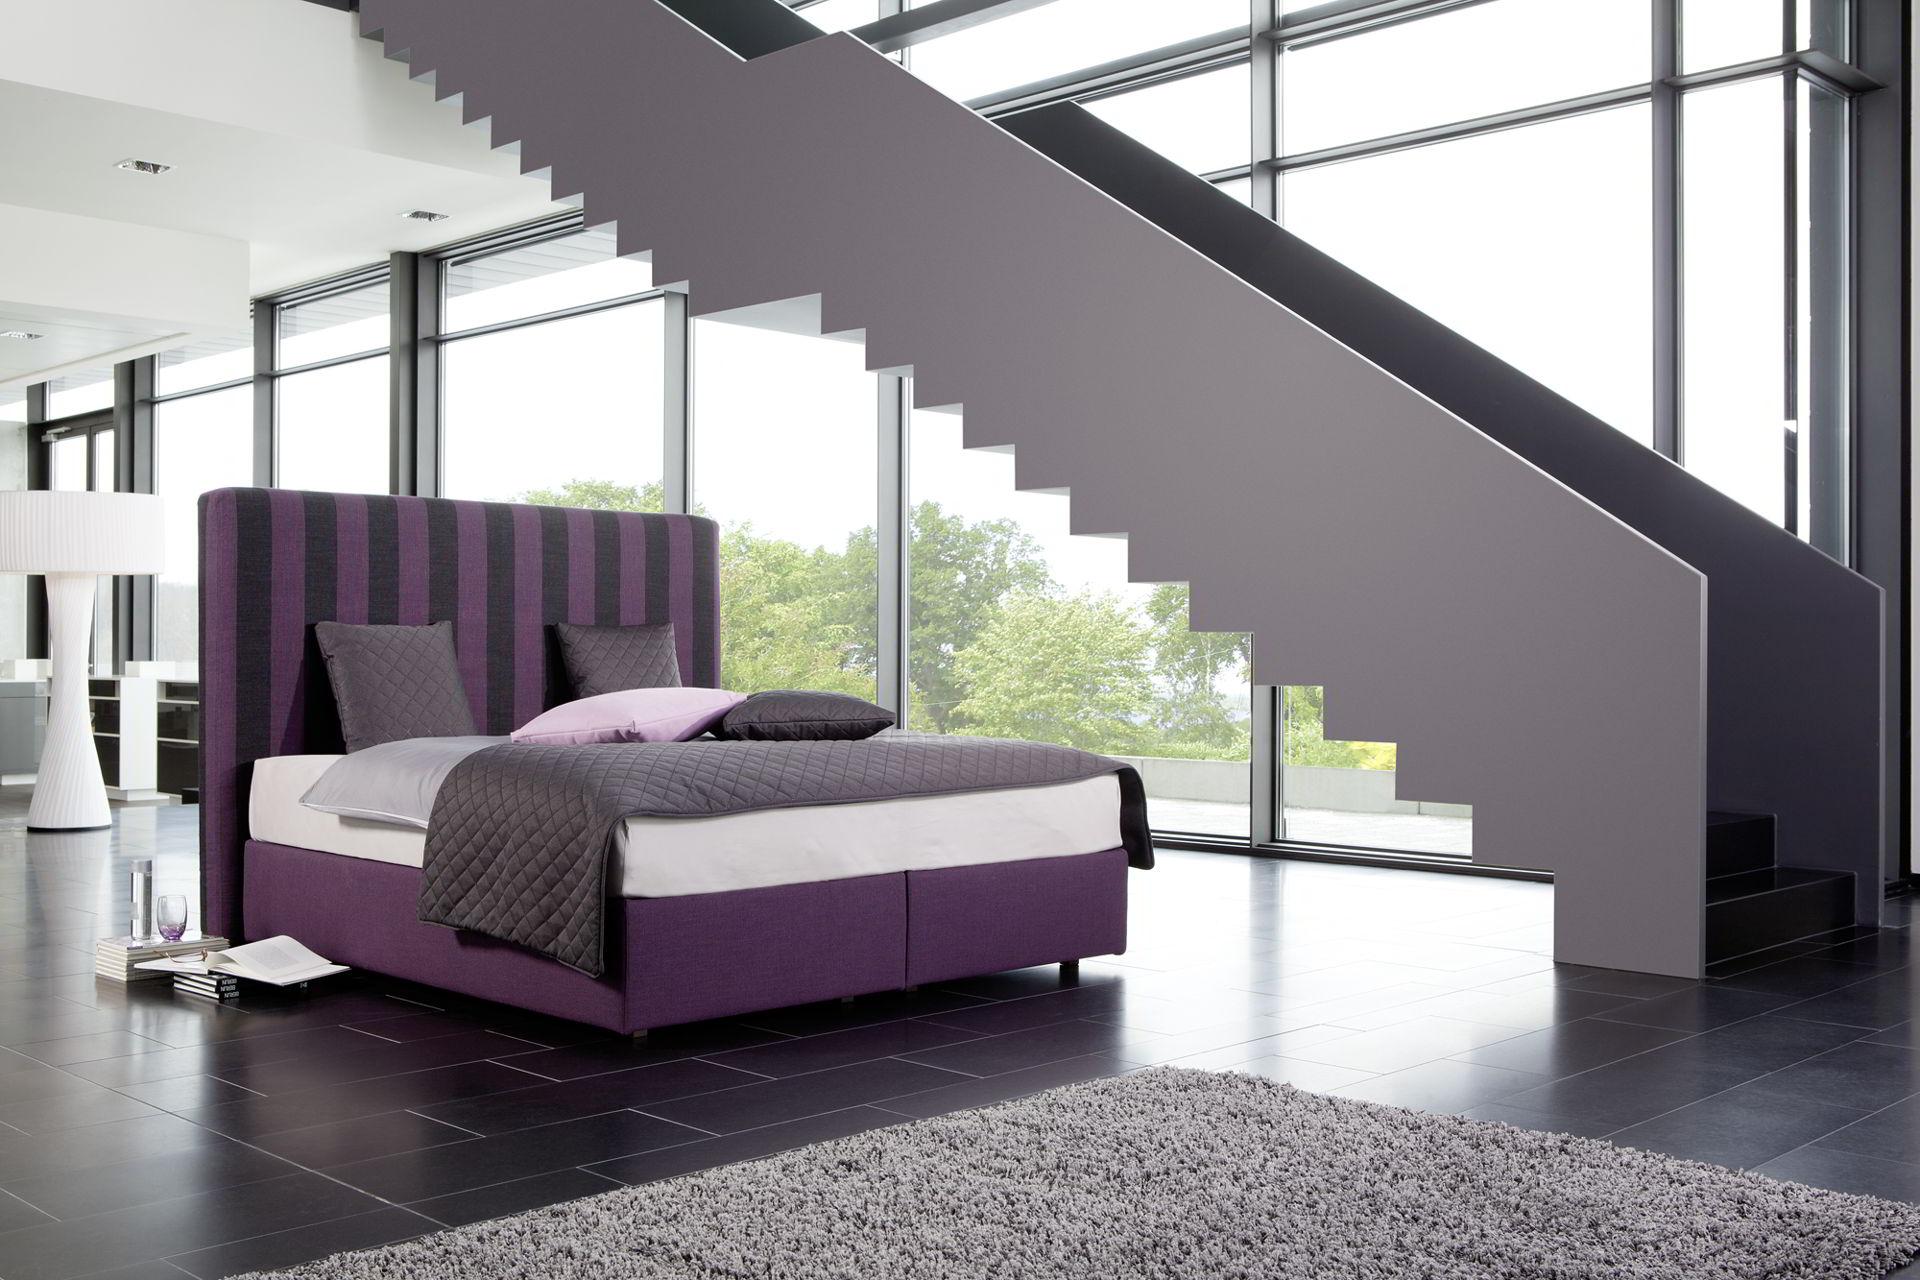 bett dreamswiss biom bel bonn. Black Bedroom Furniture Sets. Home Design Ideas